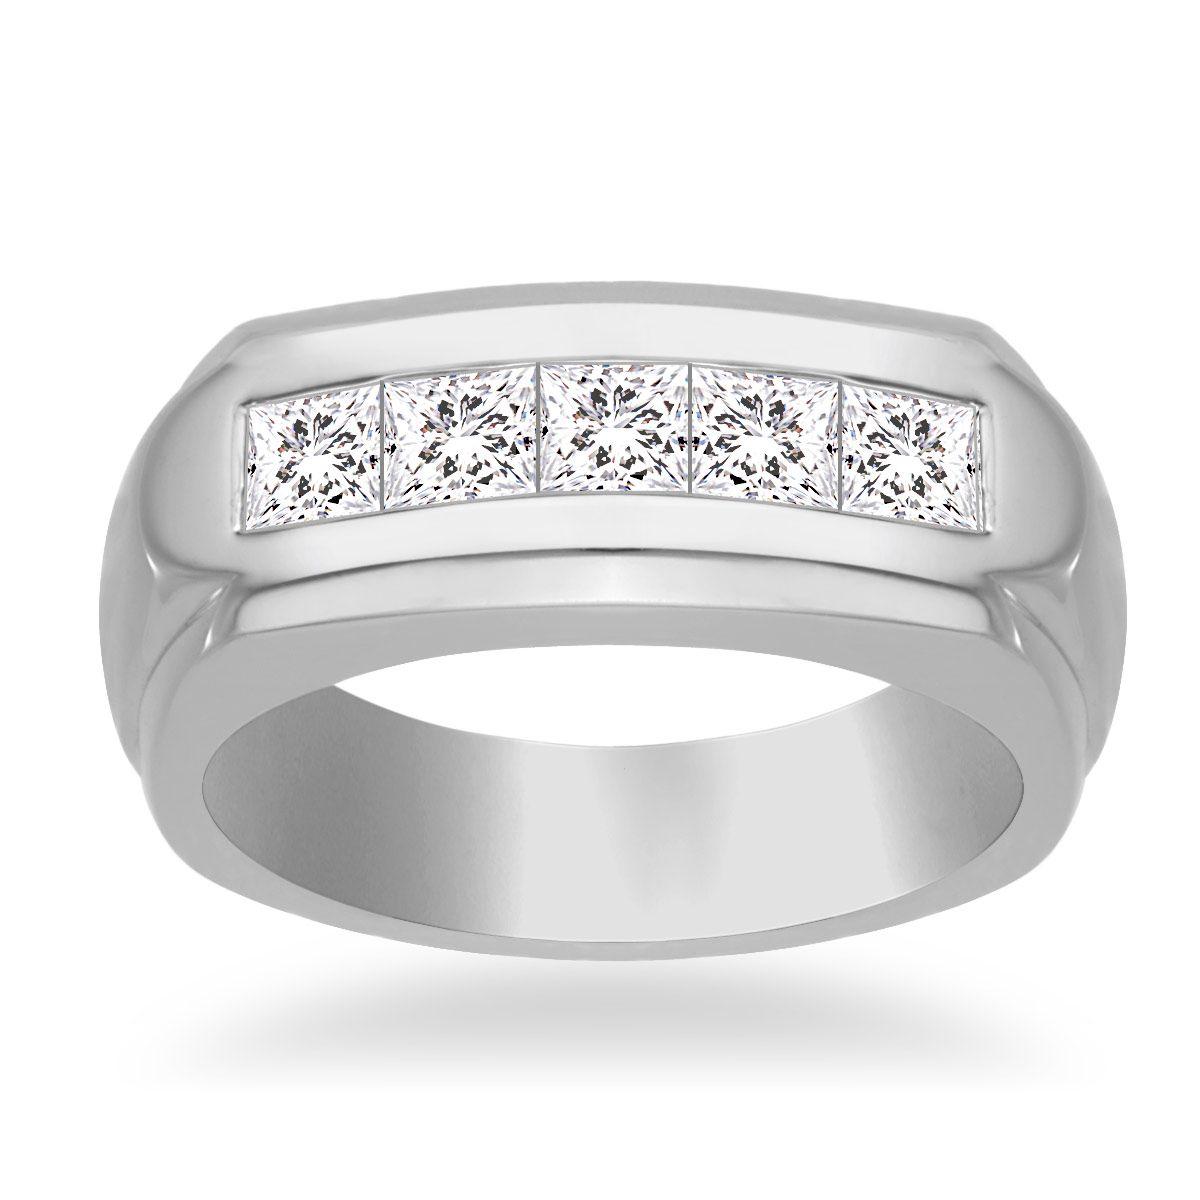 14k White Gold Channel Set Men S Diamond Band 1 00 Cttw Mens Diamond Rings Information Stoc Mens Diamond Band Mens Rings Wedding Diamond Men Diamond Ring